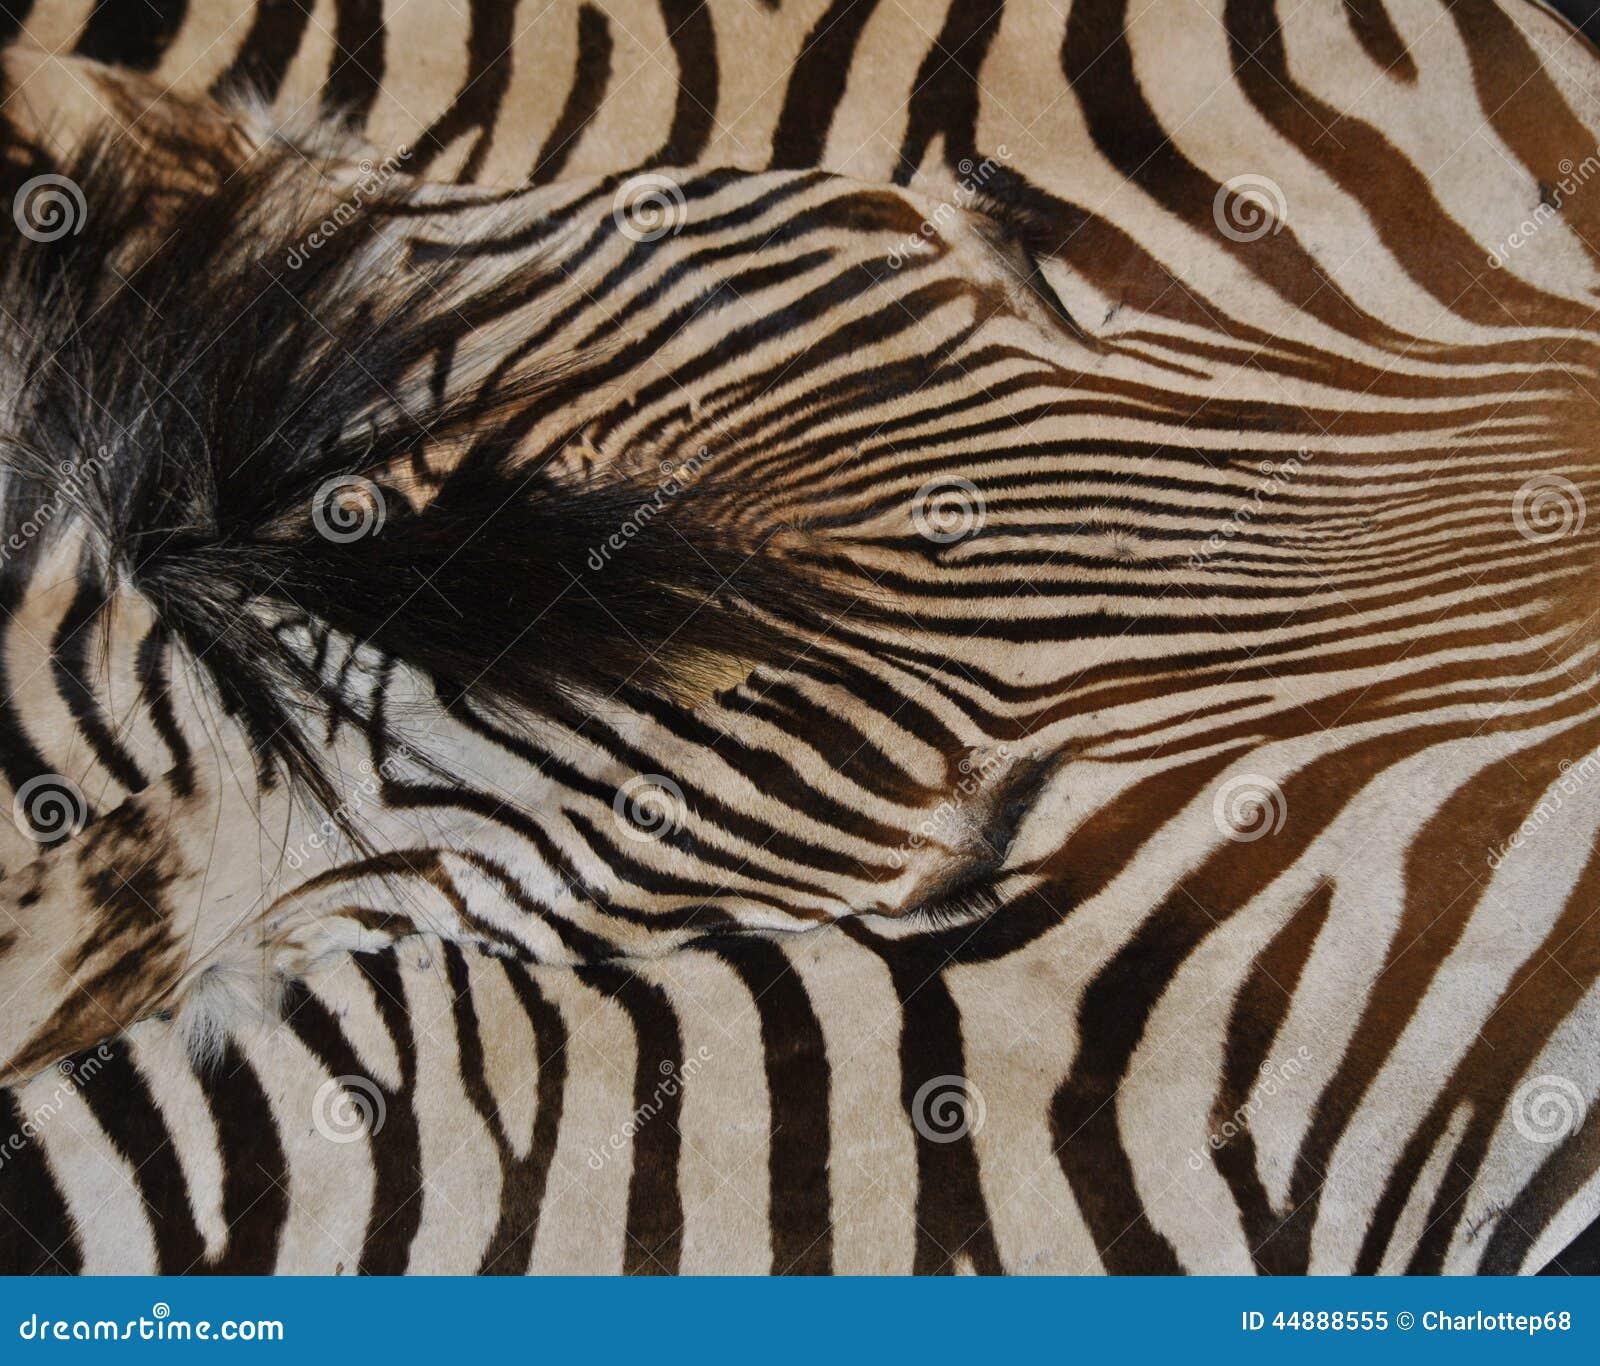 Zebra Pattern Horse Rug: Zebra Print Stock Image. Image Of Striped, Pattern, Unique